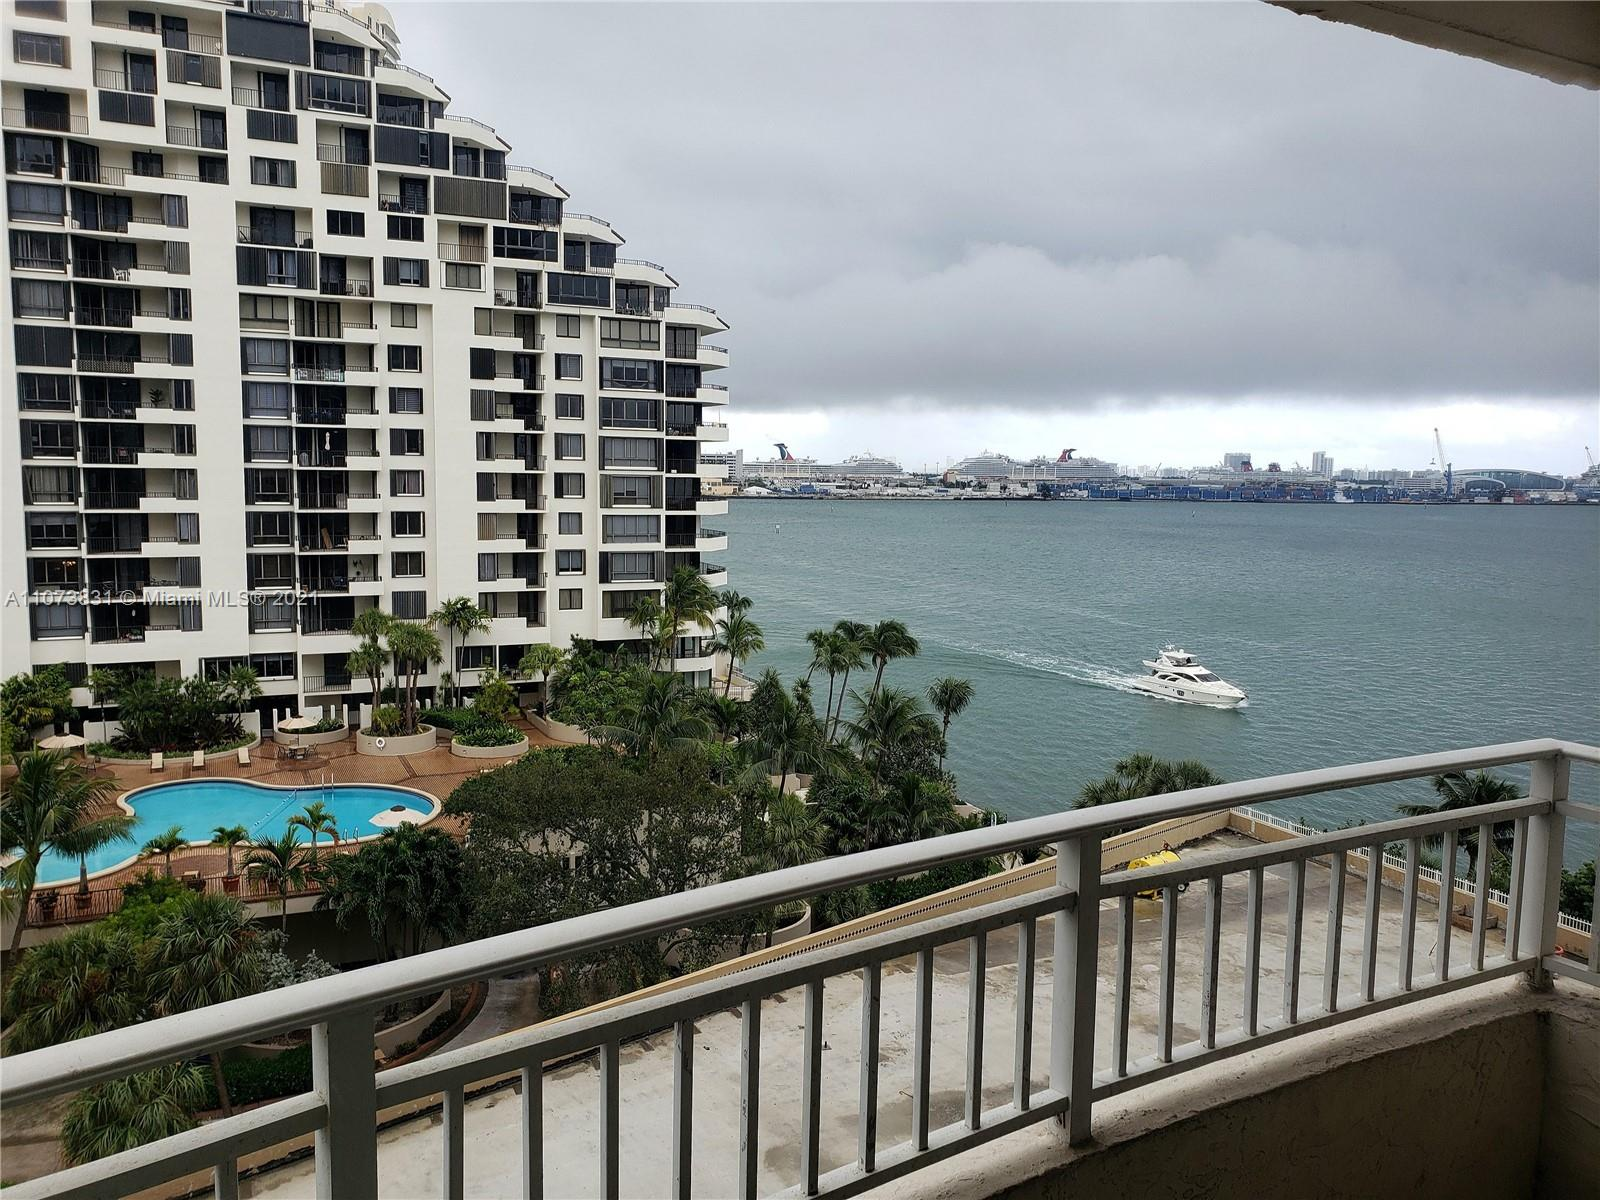 Isola #907 - 770 Claughton Island Dr #907, Miami, FL 33131